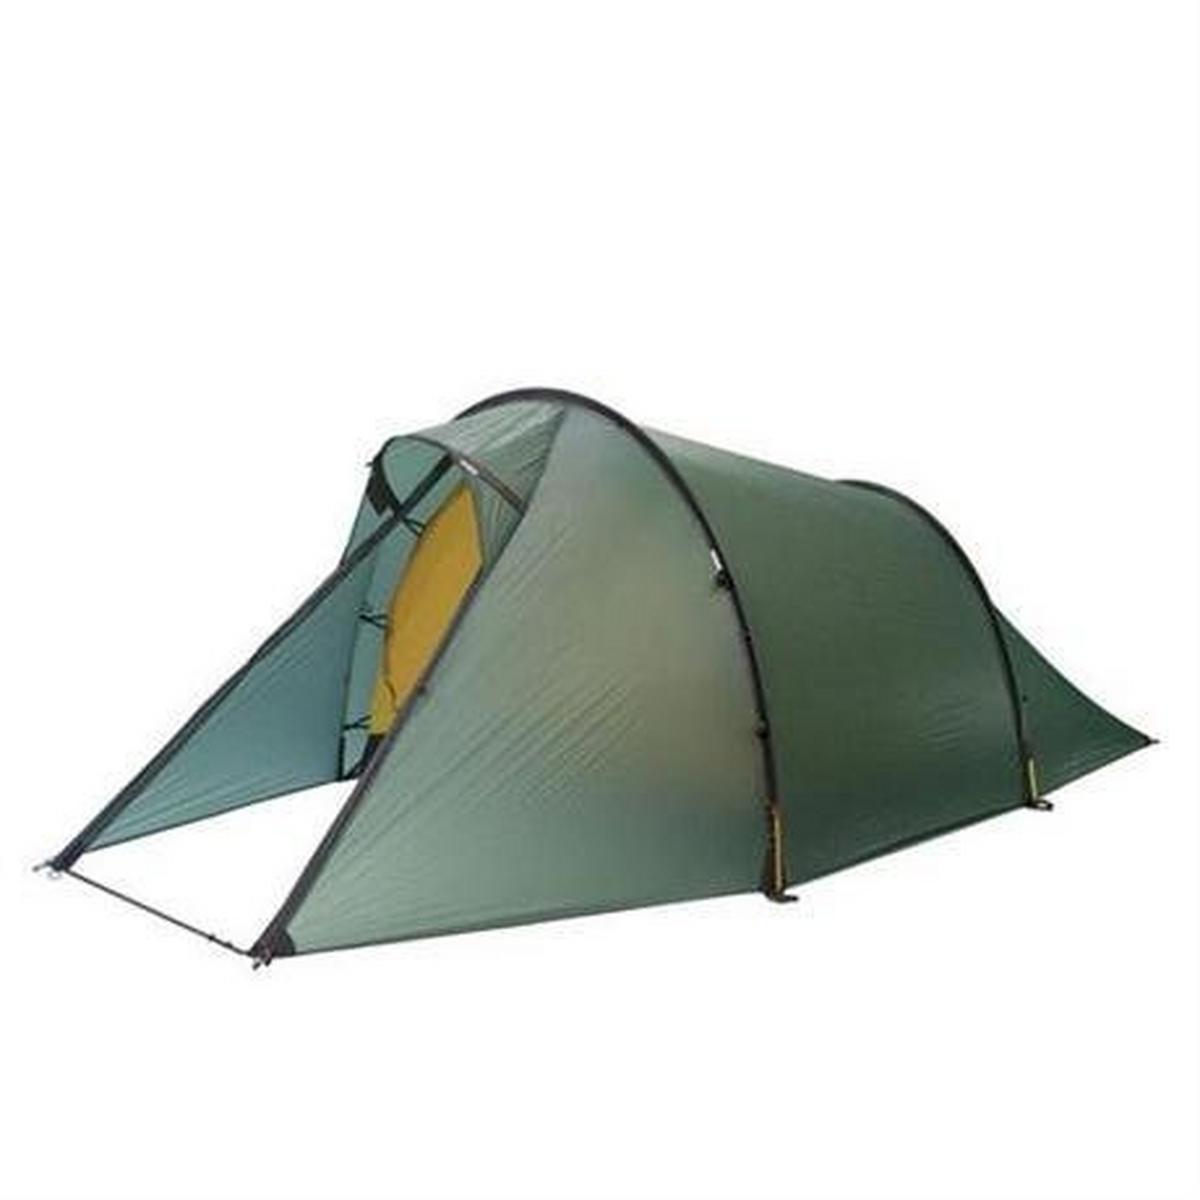 Hilleberg Nallo 2 (Green) - Two Person Tent